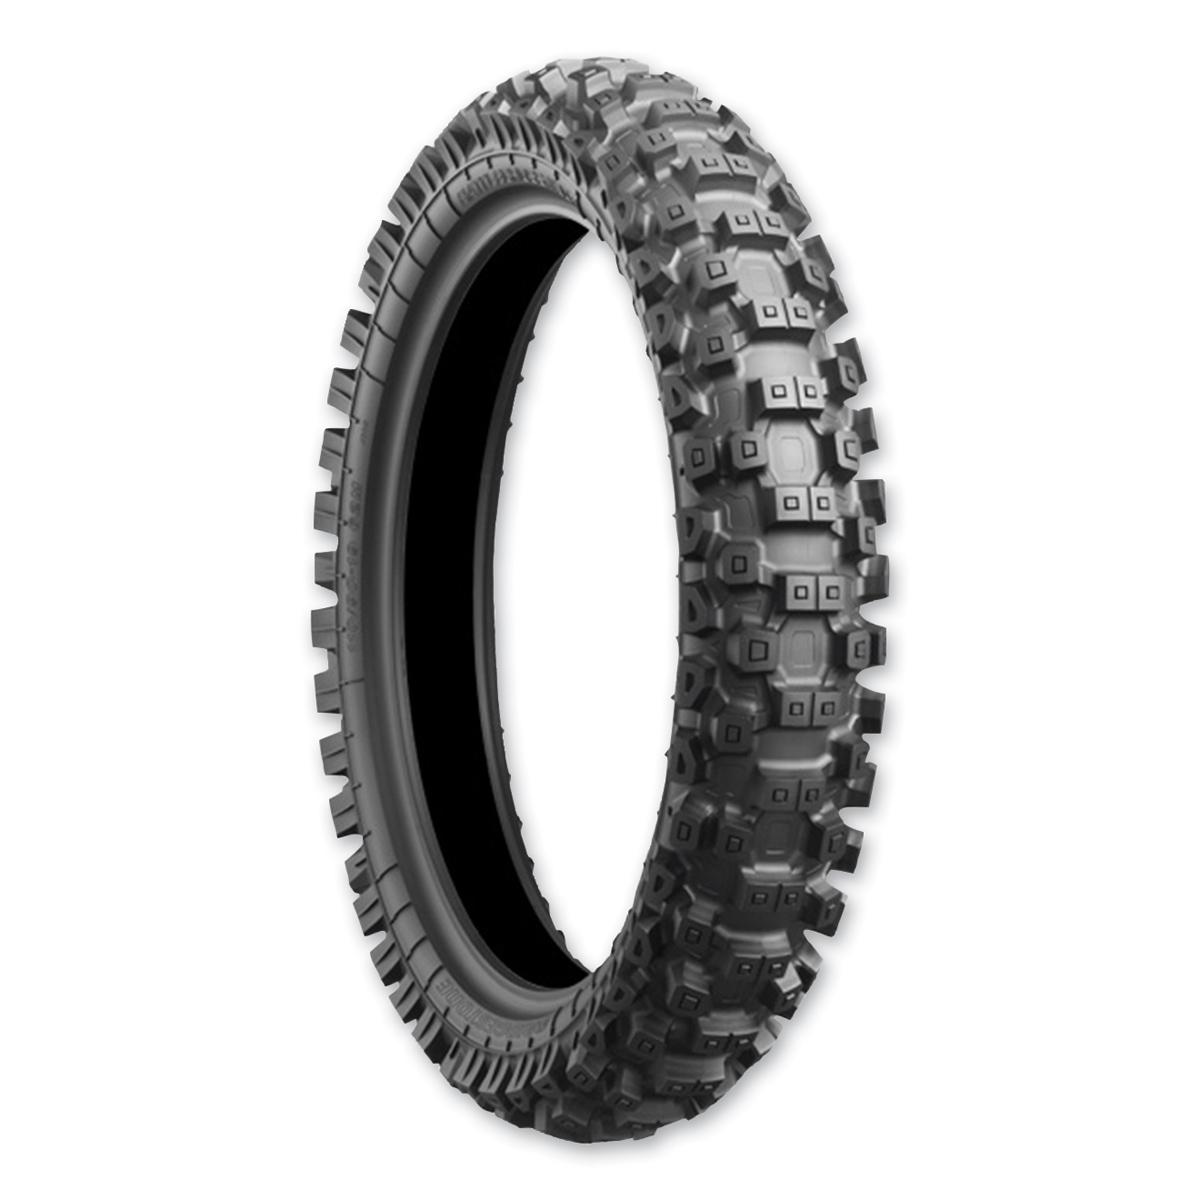 Bridgestone Battlecross X30 100/90-19 I/T Rear Tire